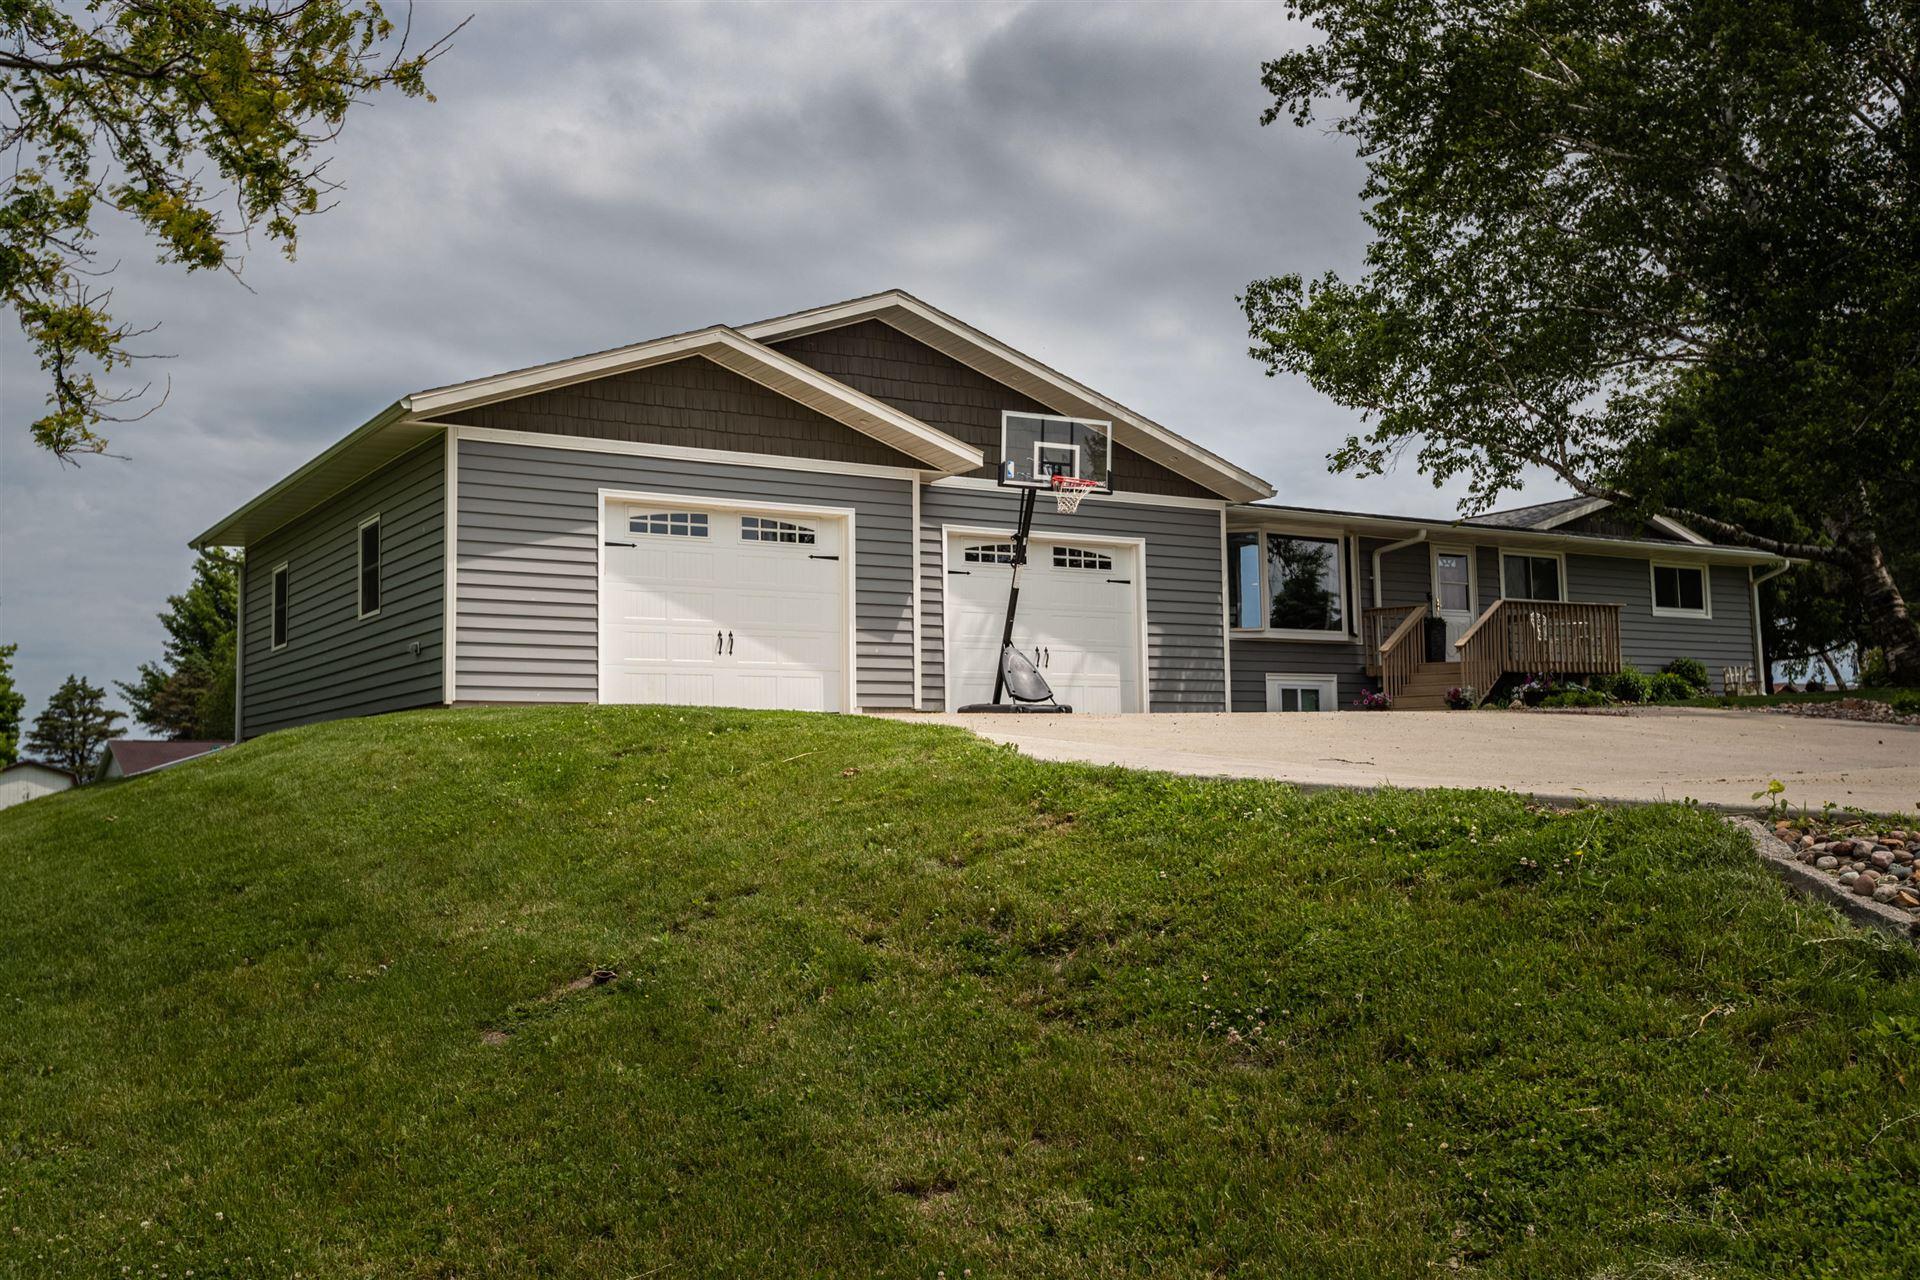 E7618 E Smith Rd, Viroqua, WI 54667 - MLS#: 1694173